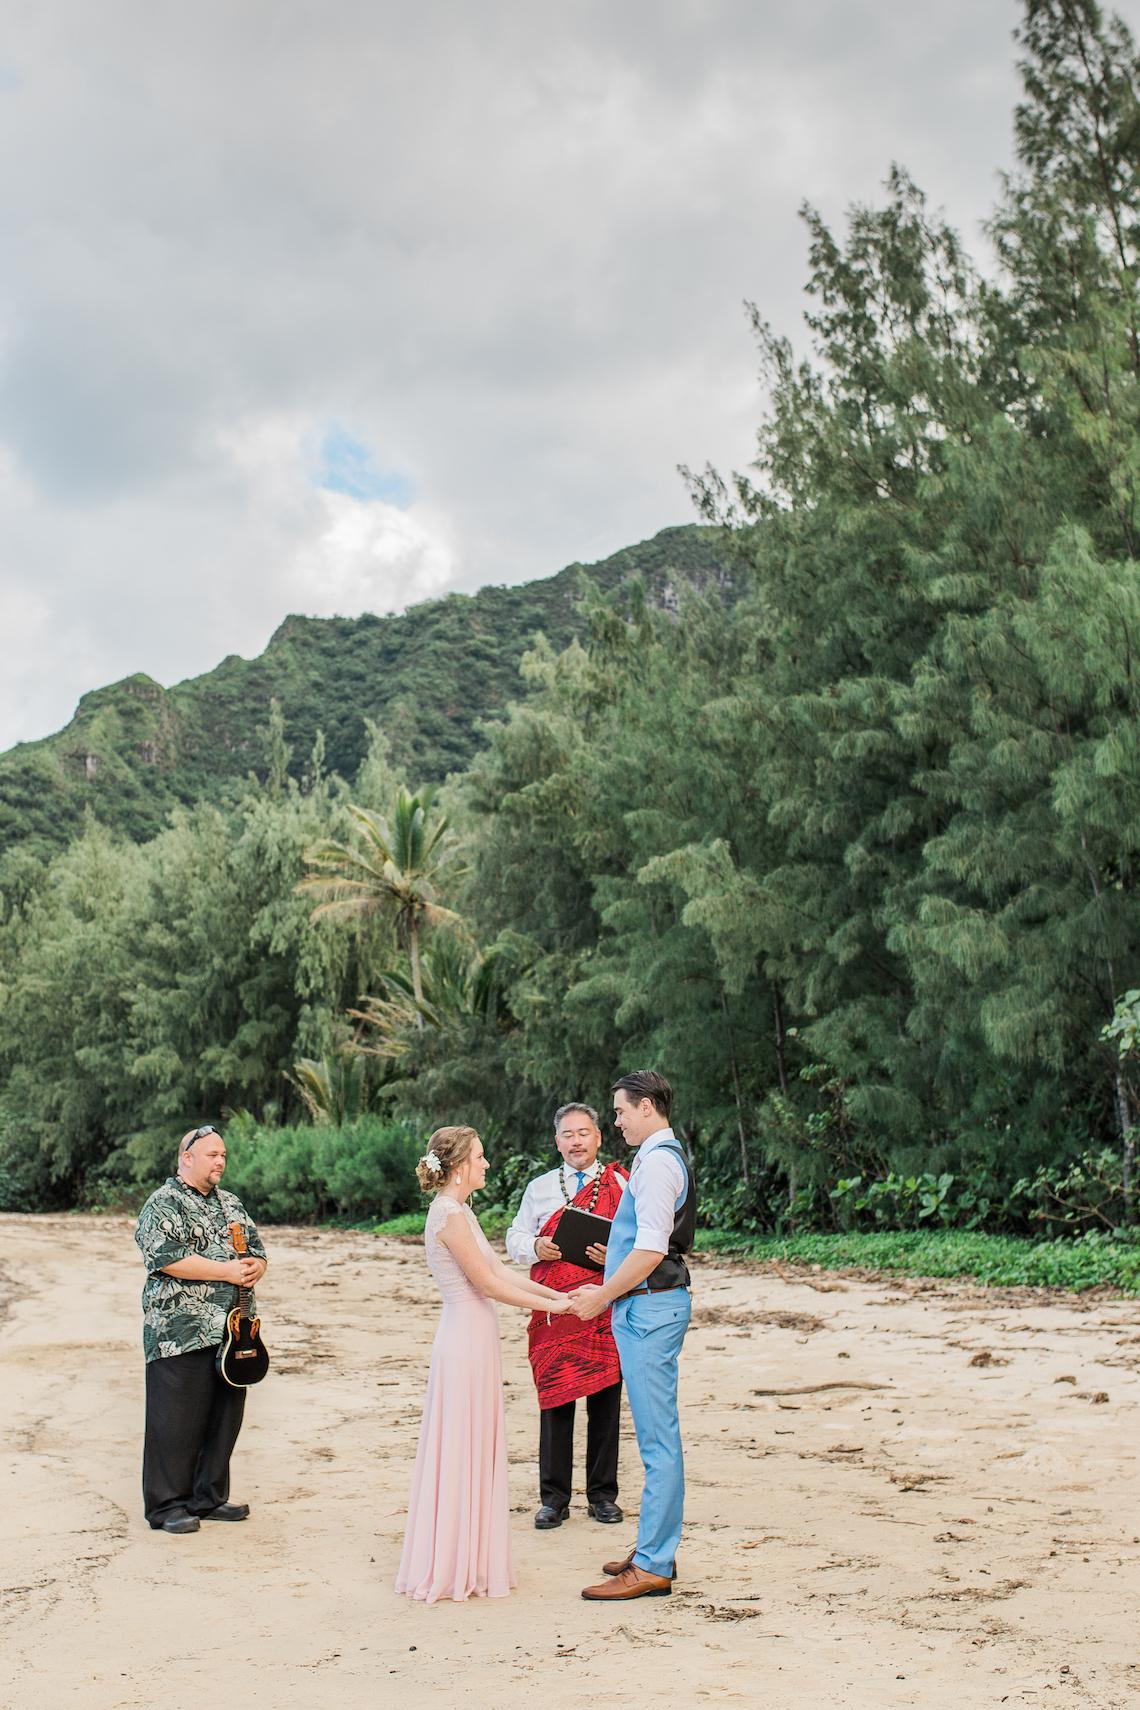 Intimate & Scenic Traditional Hawaiian Lei Exchange Elopement – Chelsea Stratso 10